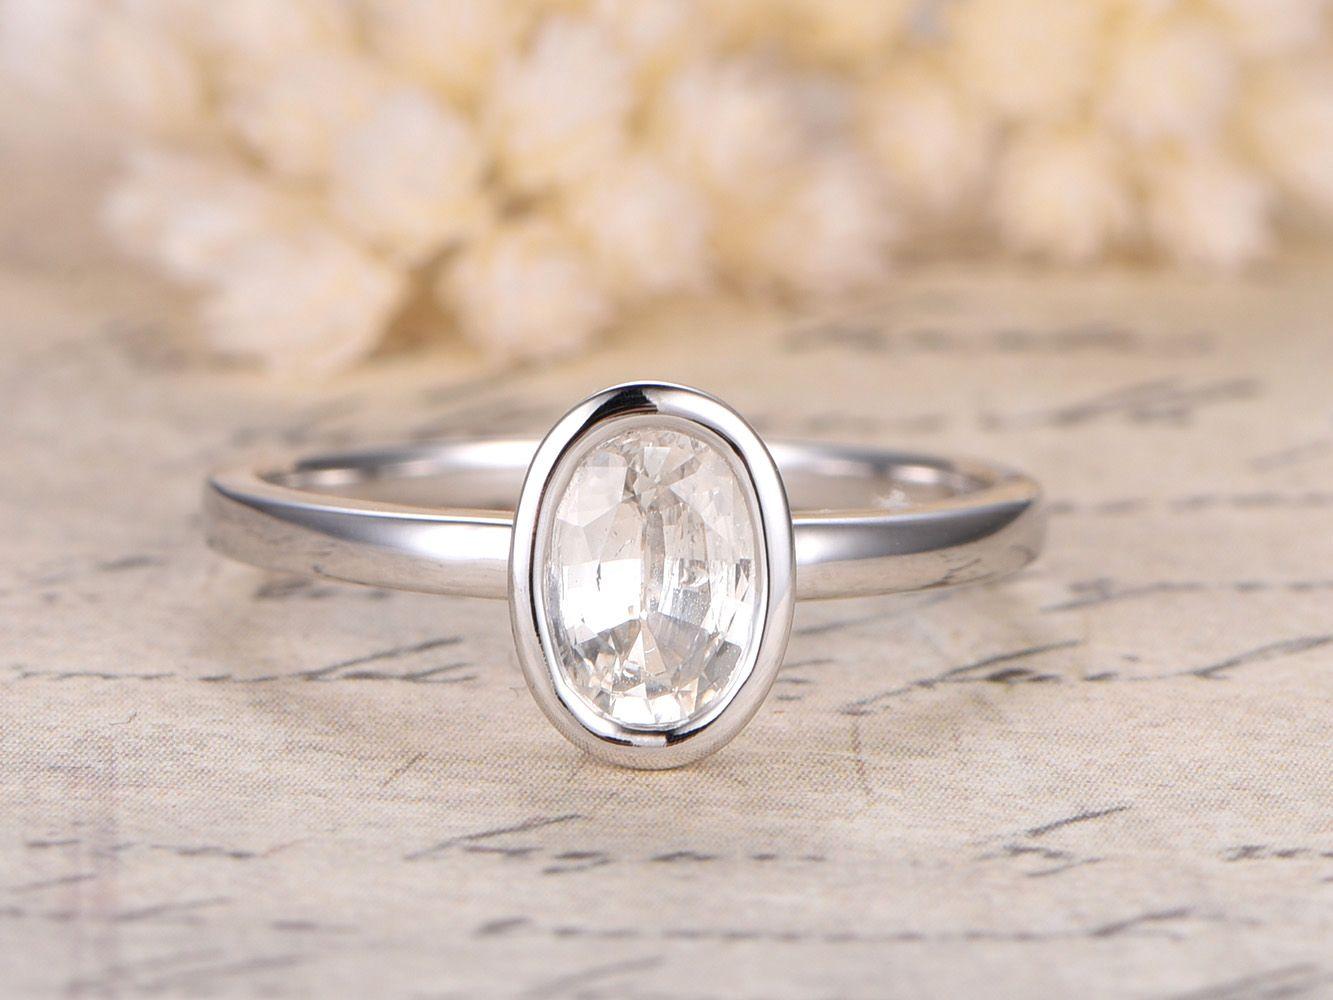 white sapphire wedding rings White Sapphire Ring mm Oval Cut Stone 14K Plain White Gold Sapphire Bezel